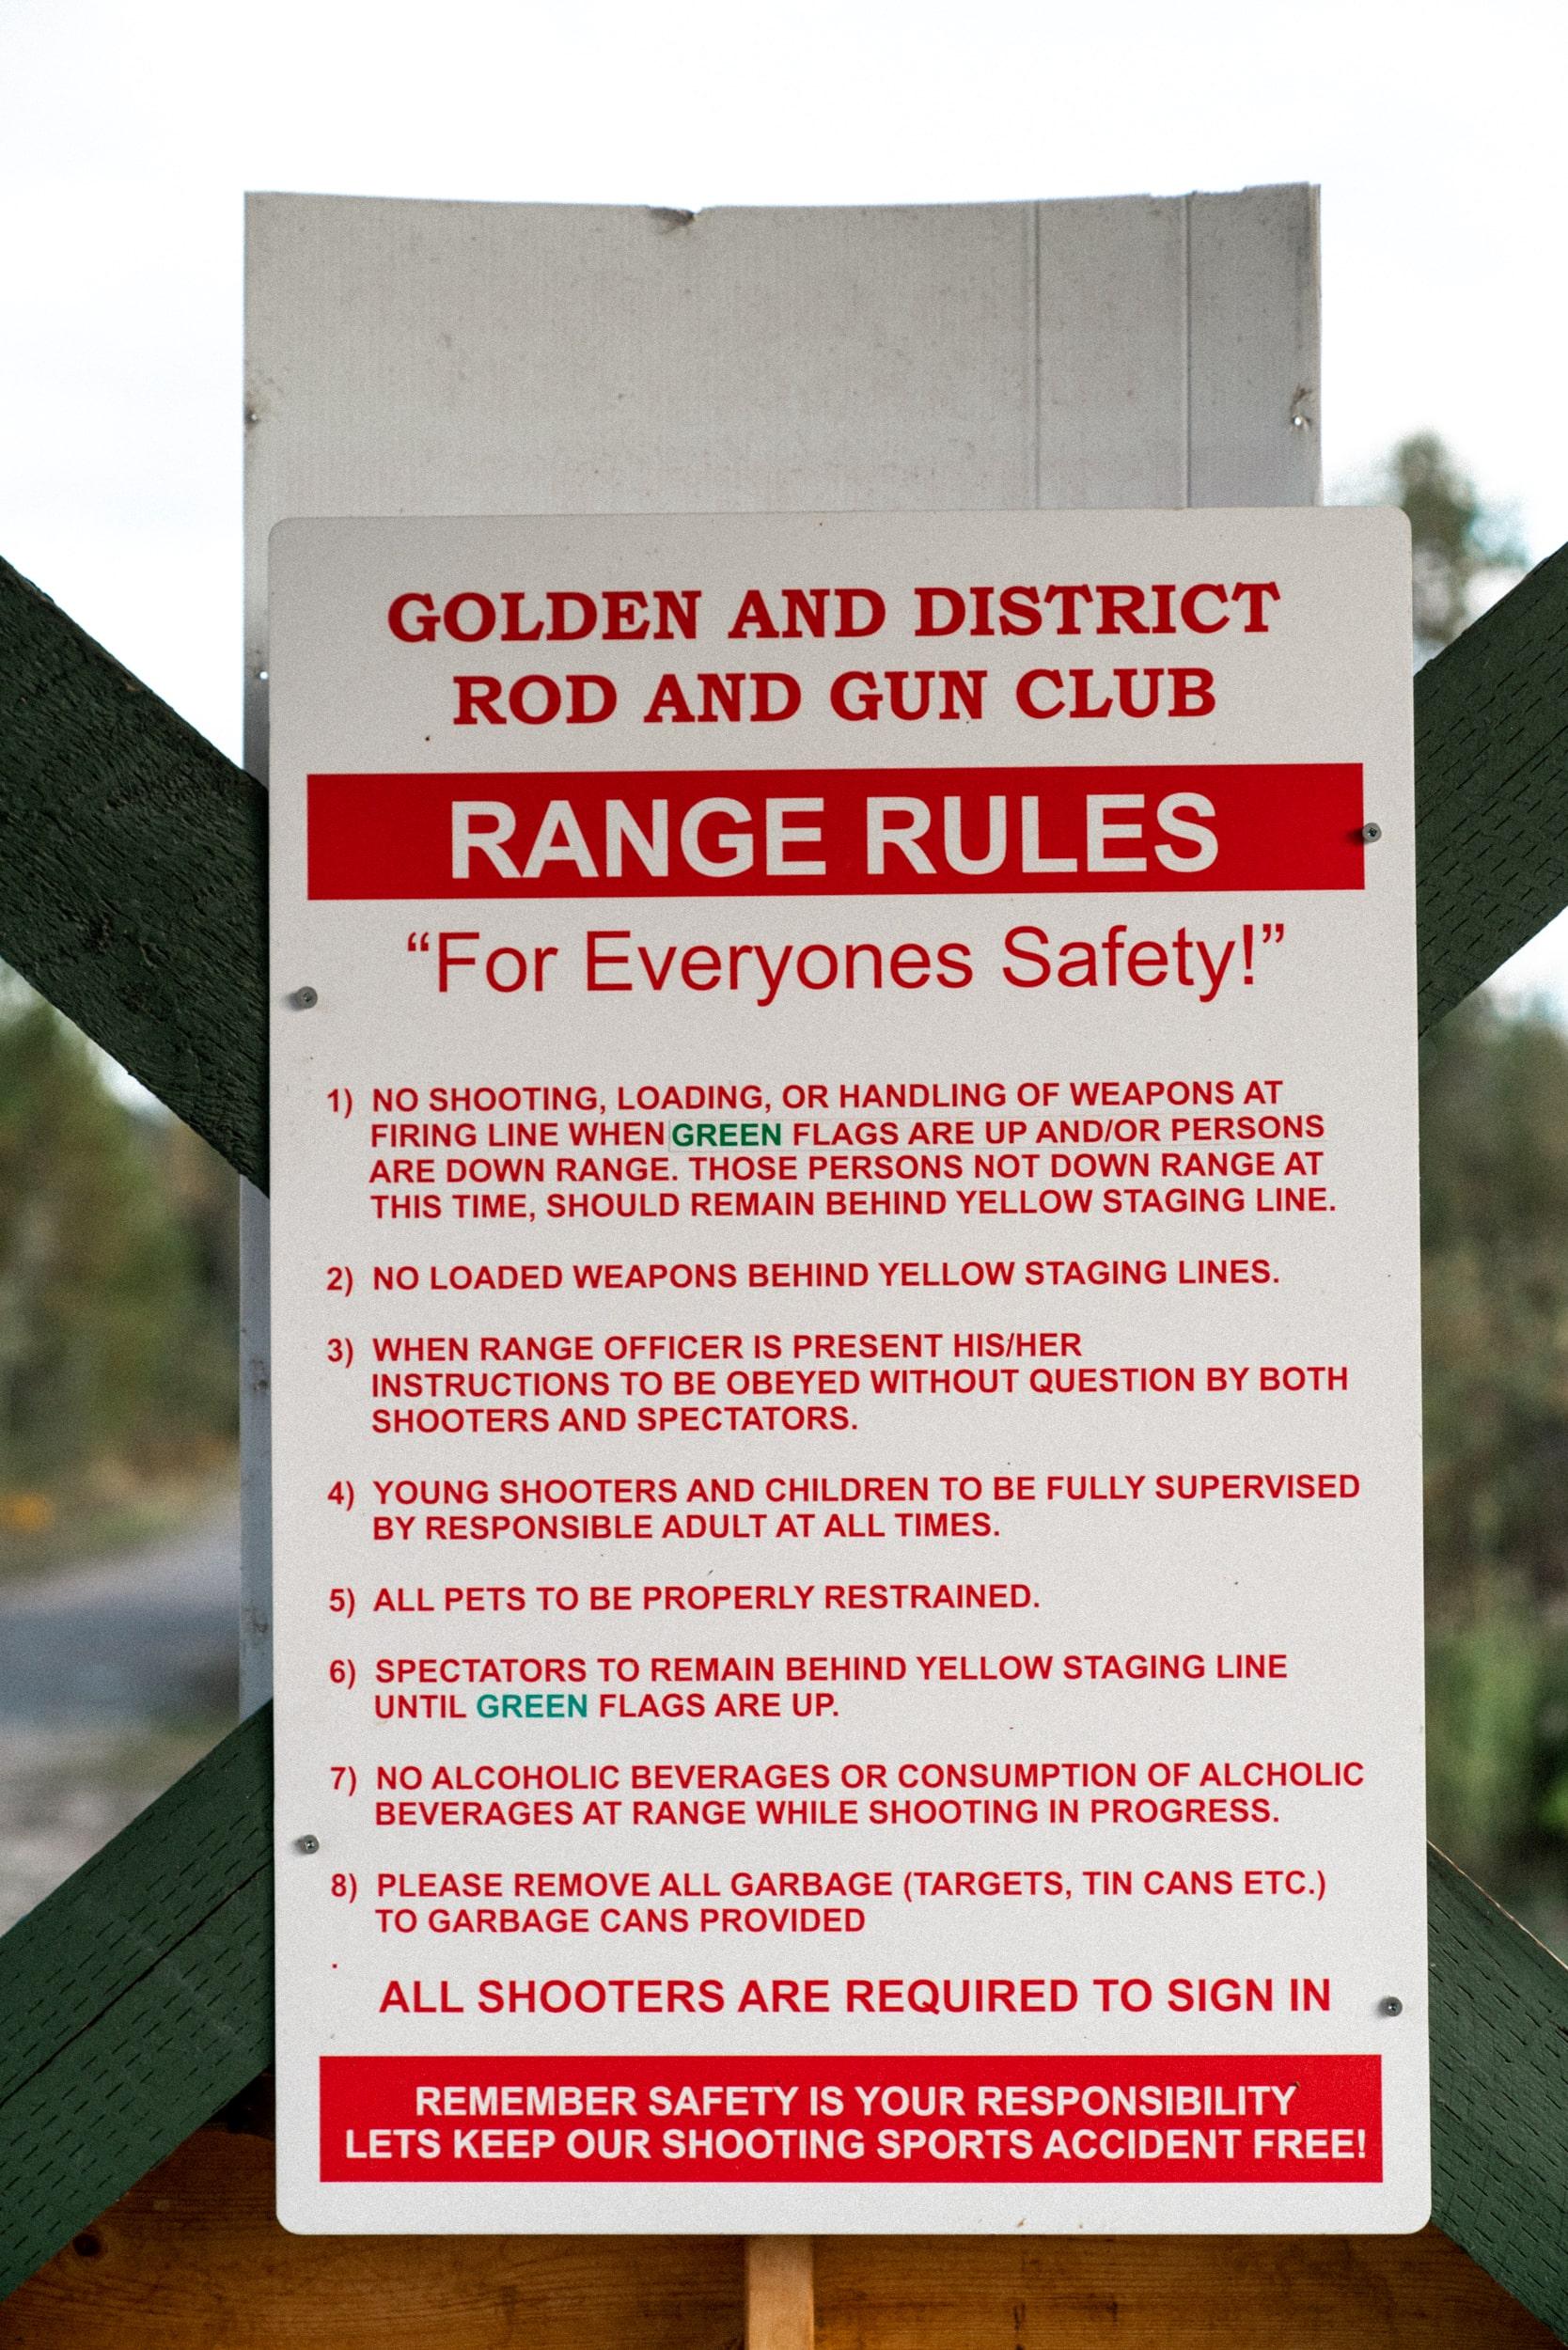 GoldenRod&GunClub-27-min.jpg